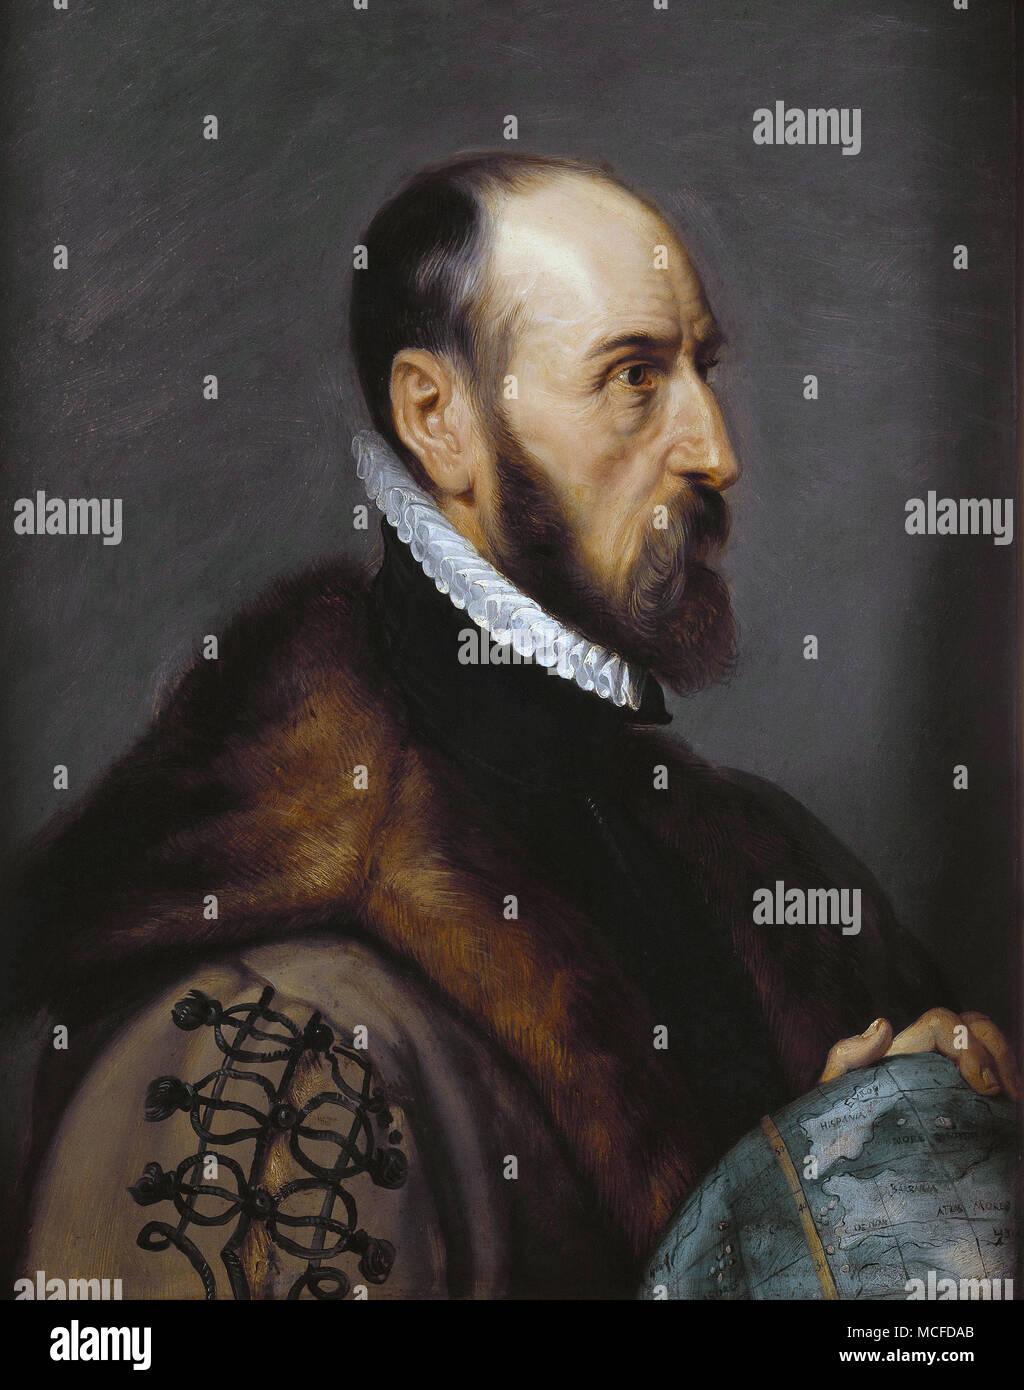 ABRAHAM ORTELIUS (1527-1598), cartographe flamand. Peinture de Peter Paul Rubens. Photo Stock